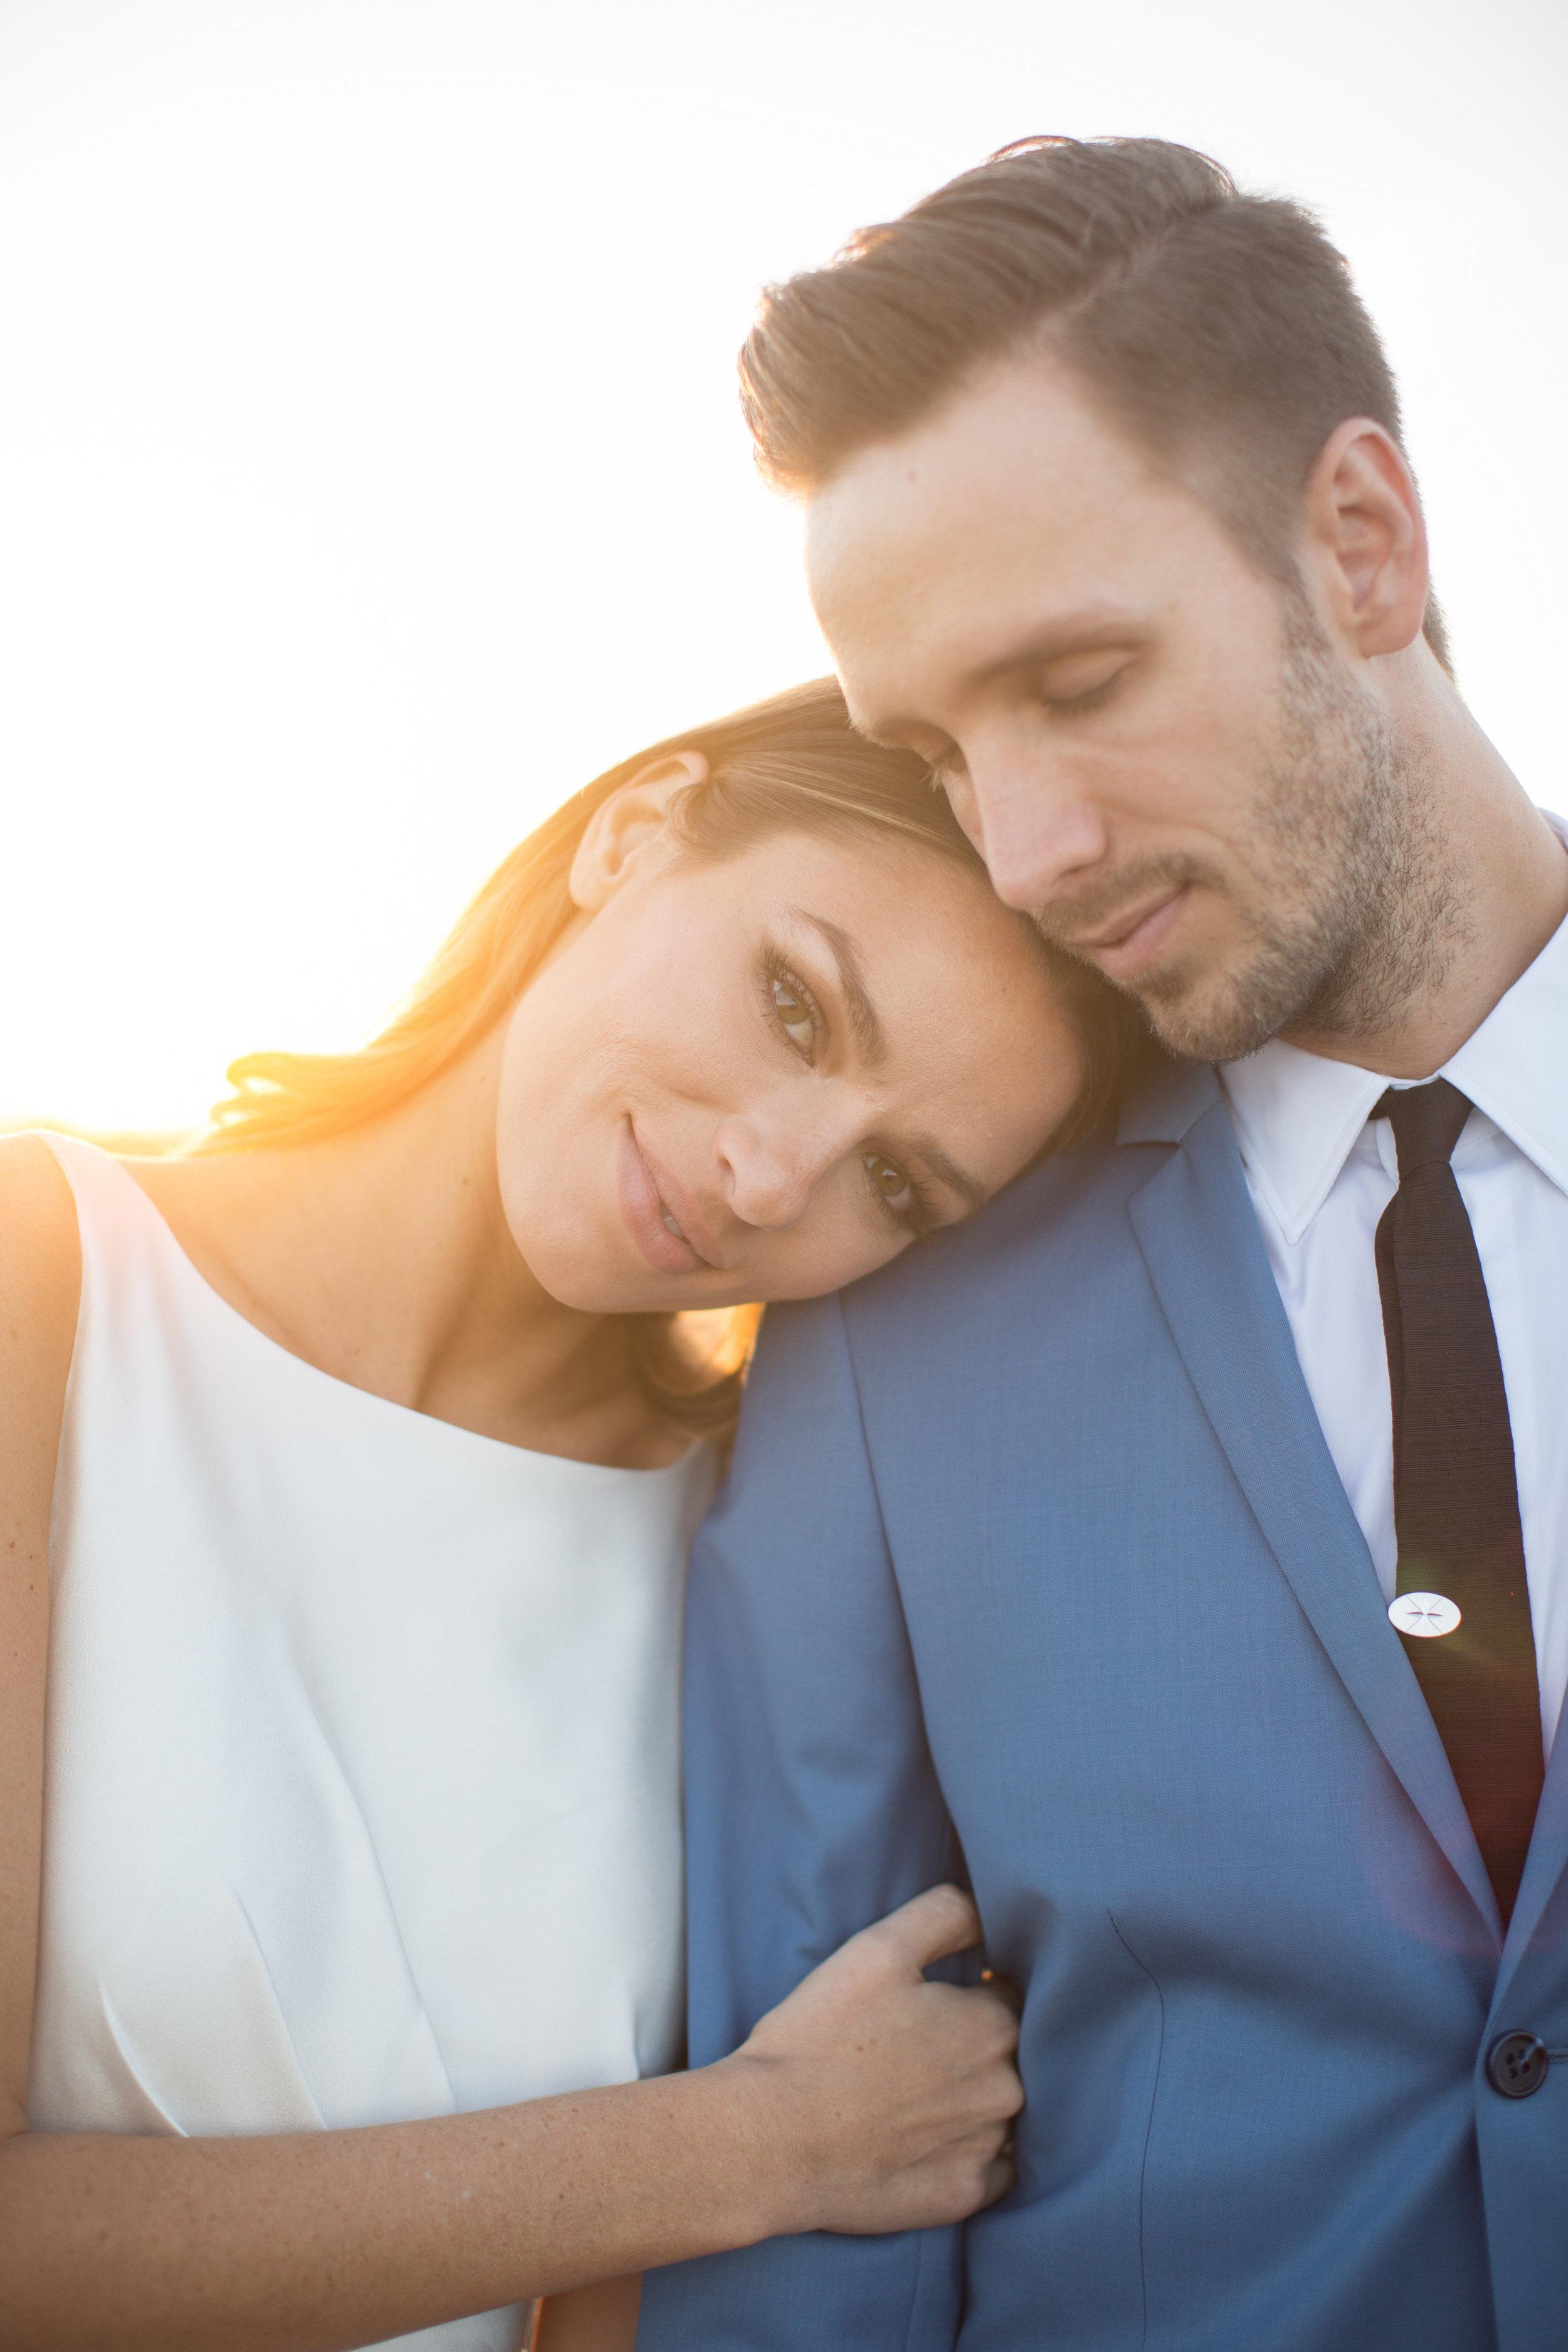 santa-barbara-ellwood-bluff-elopement-wedding-planner-coordinator-rustic-beach-front (20).jpg